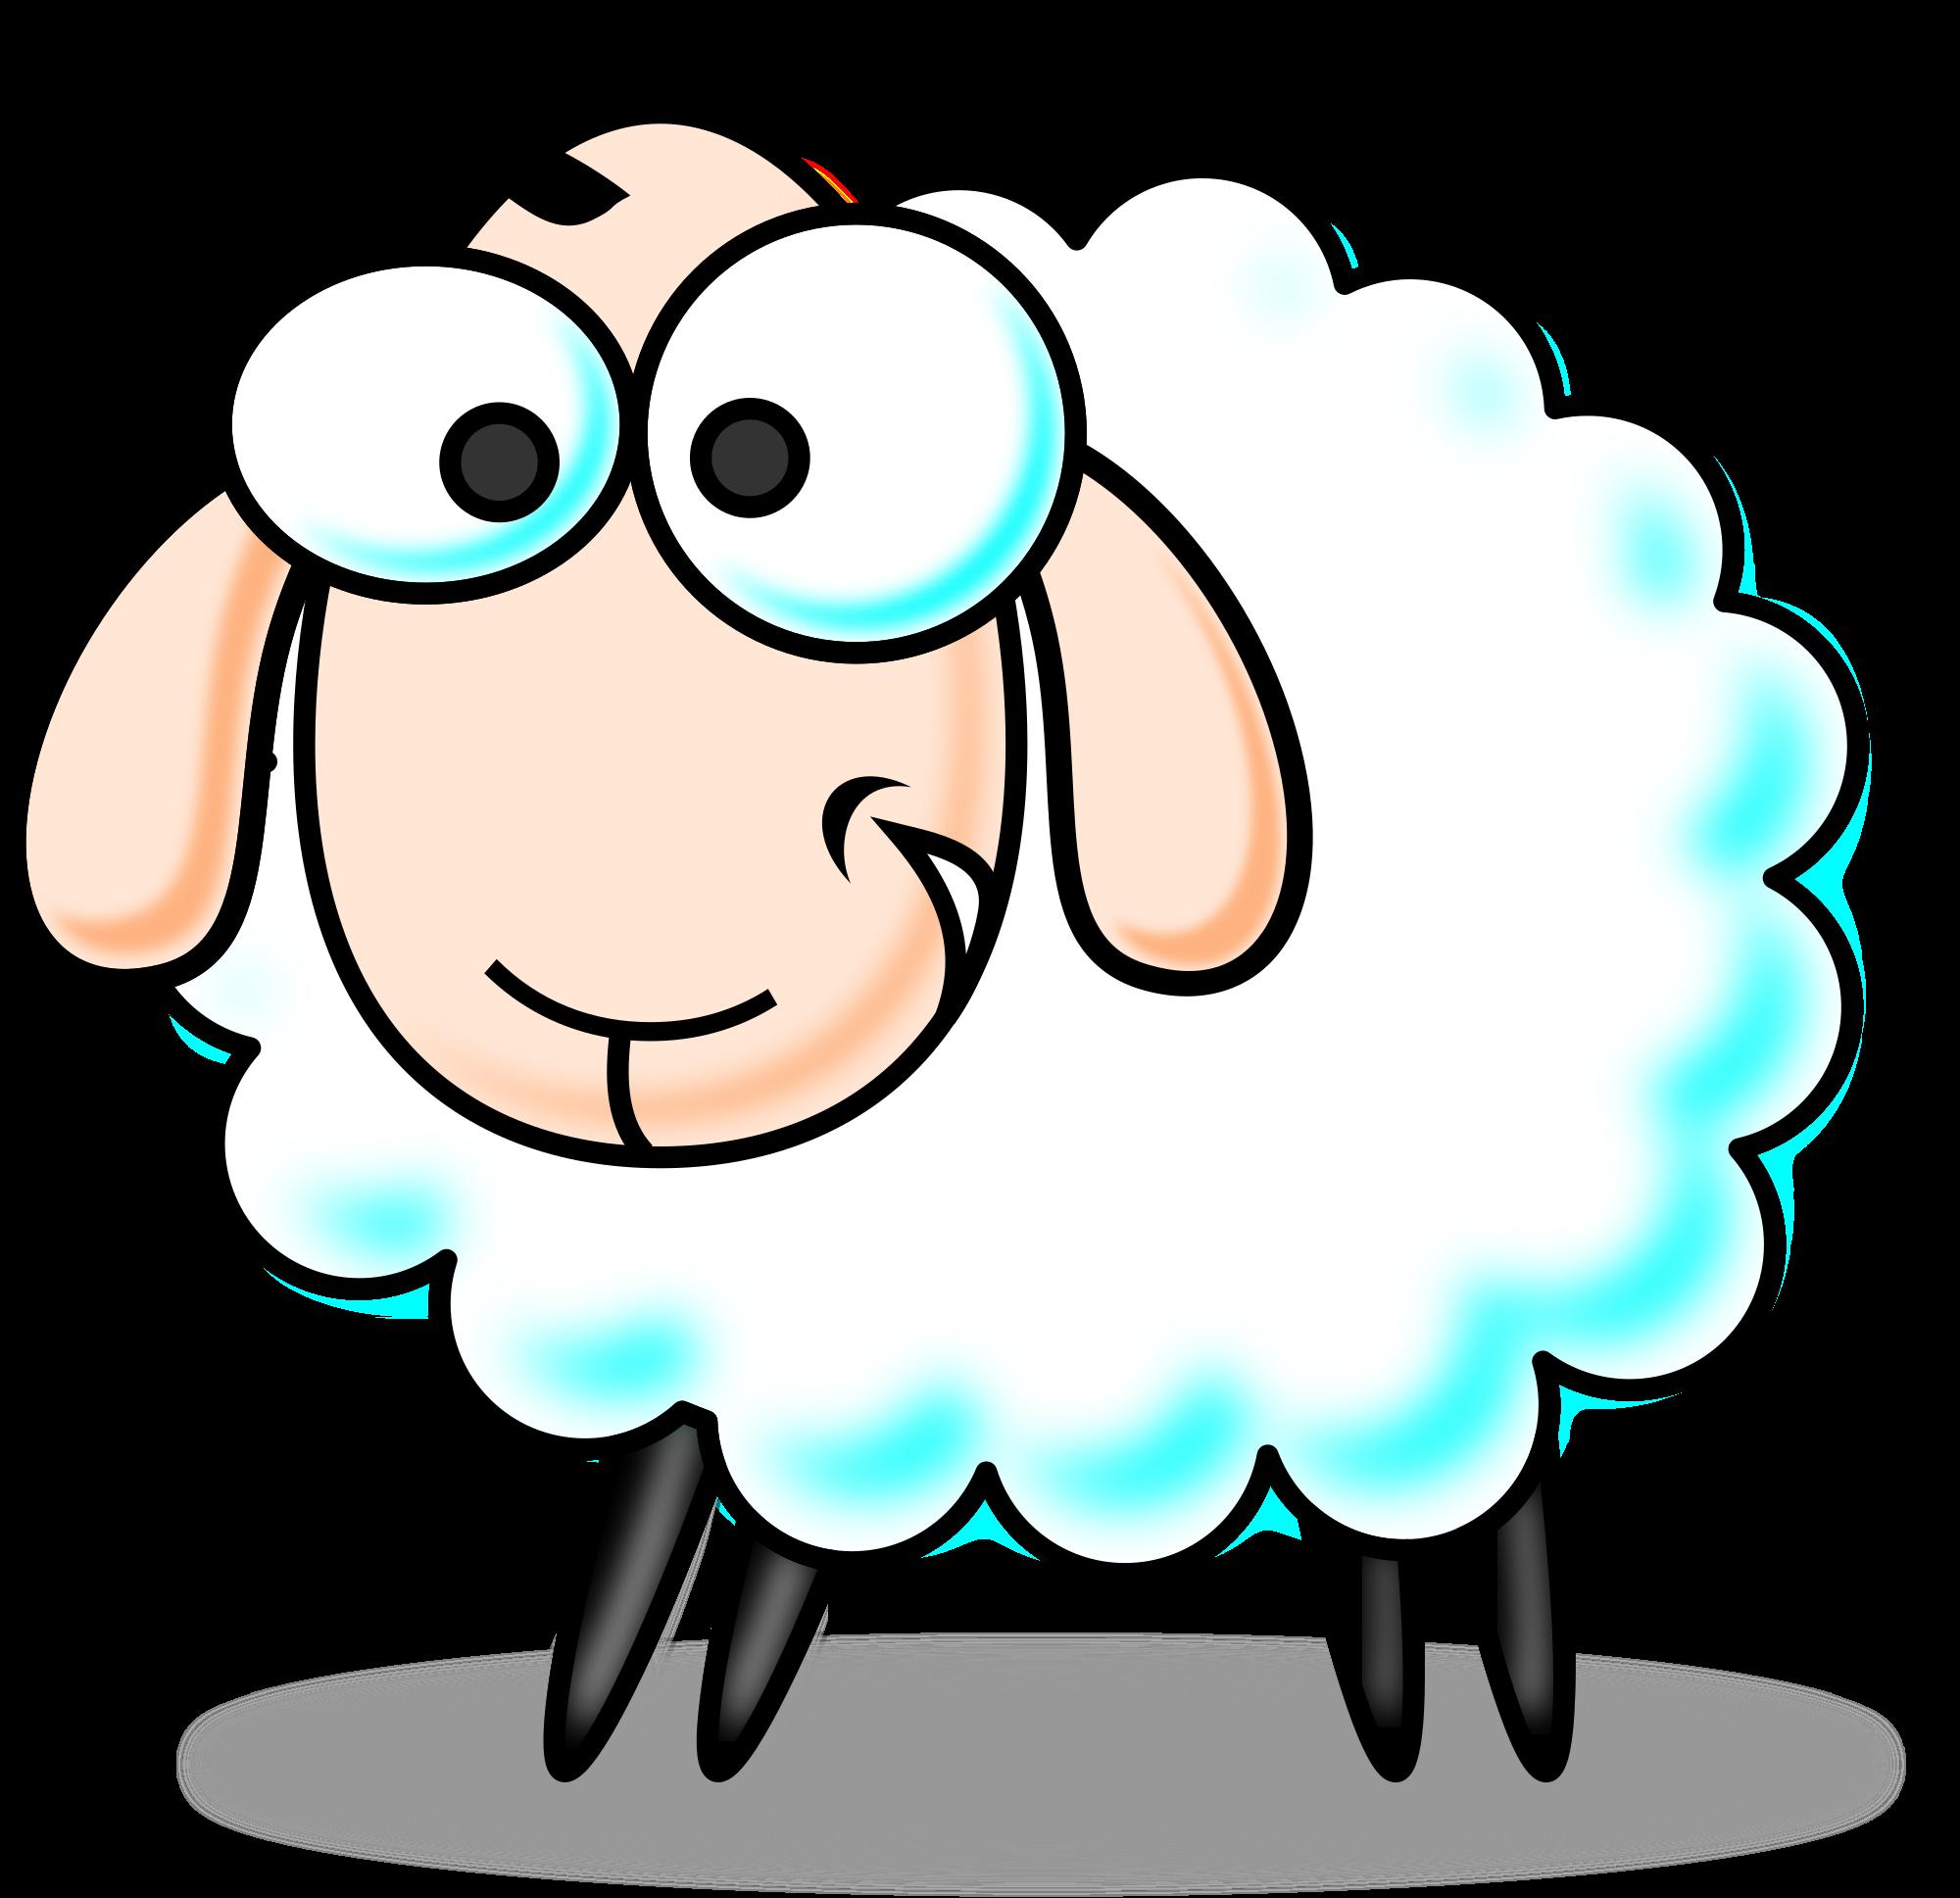 Sheep lamb clip art free clipart images 2 cliparting